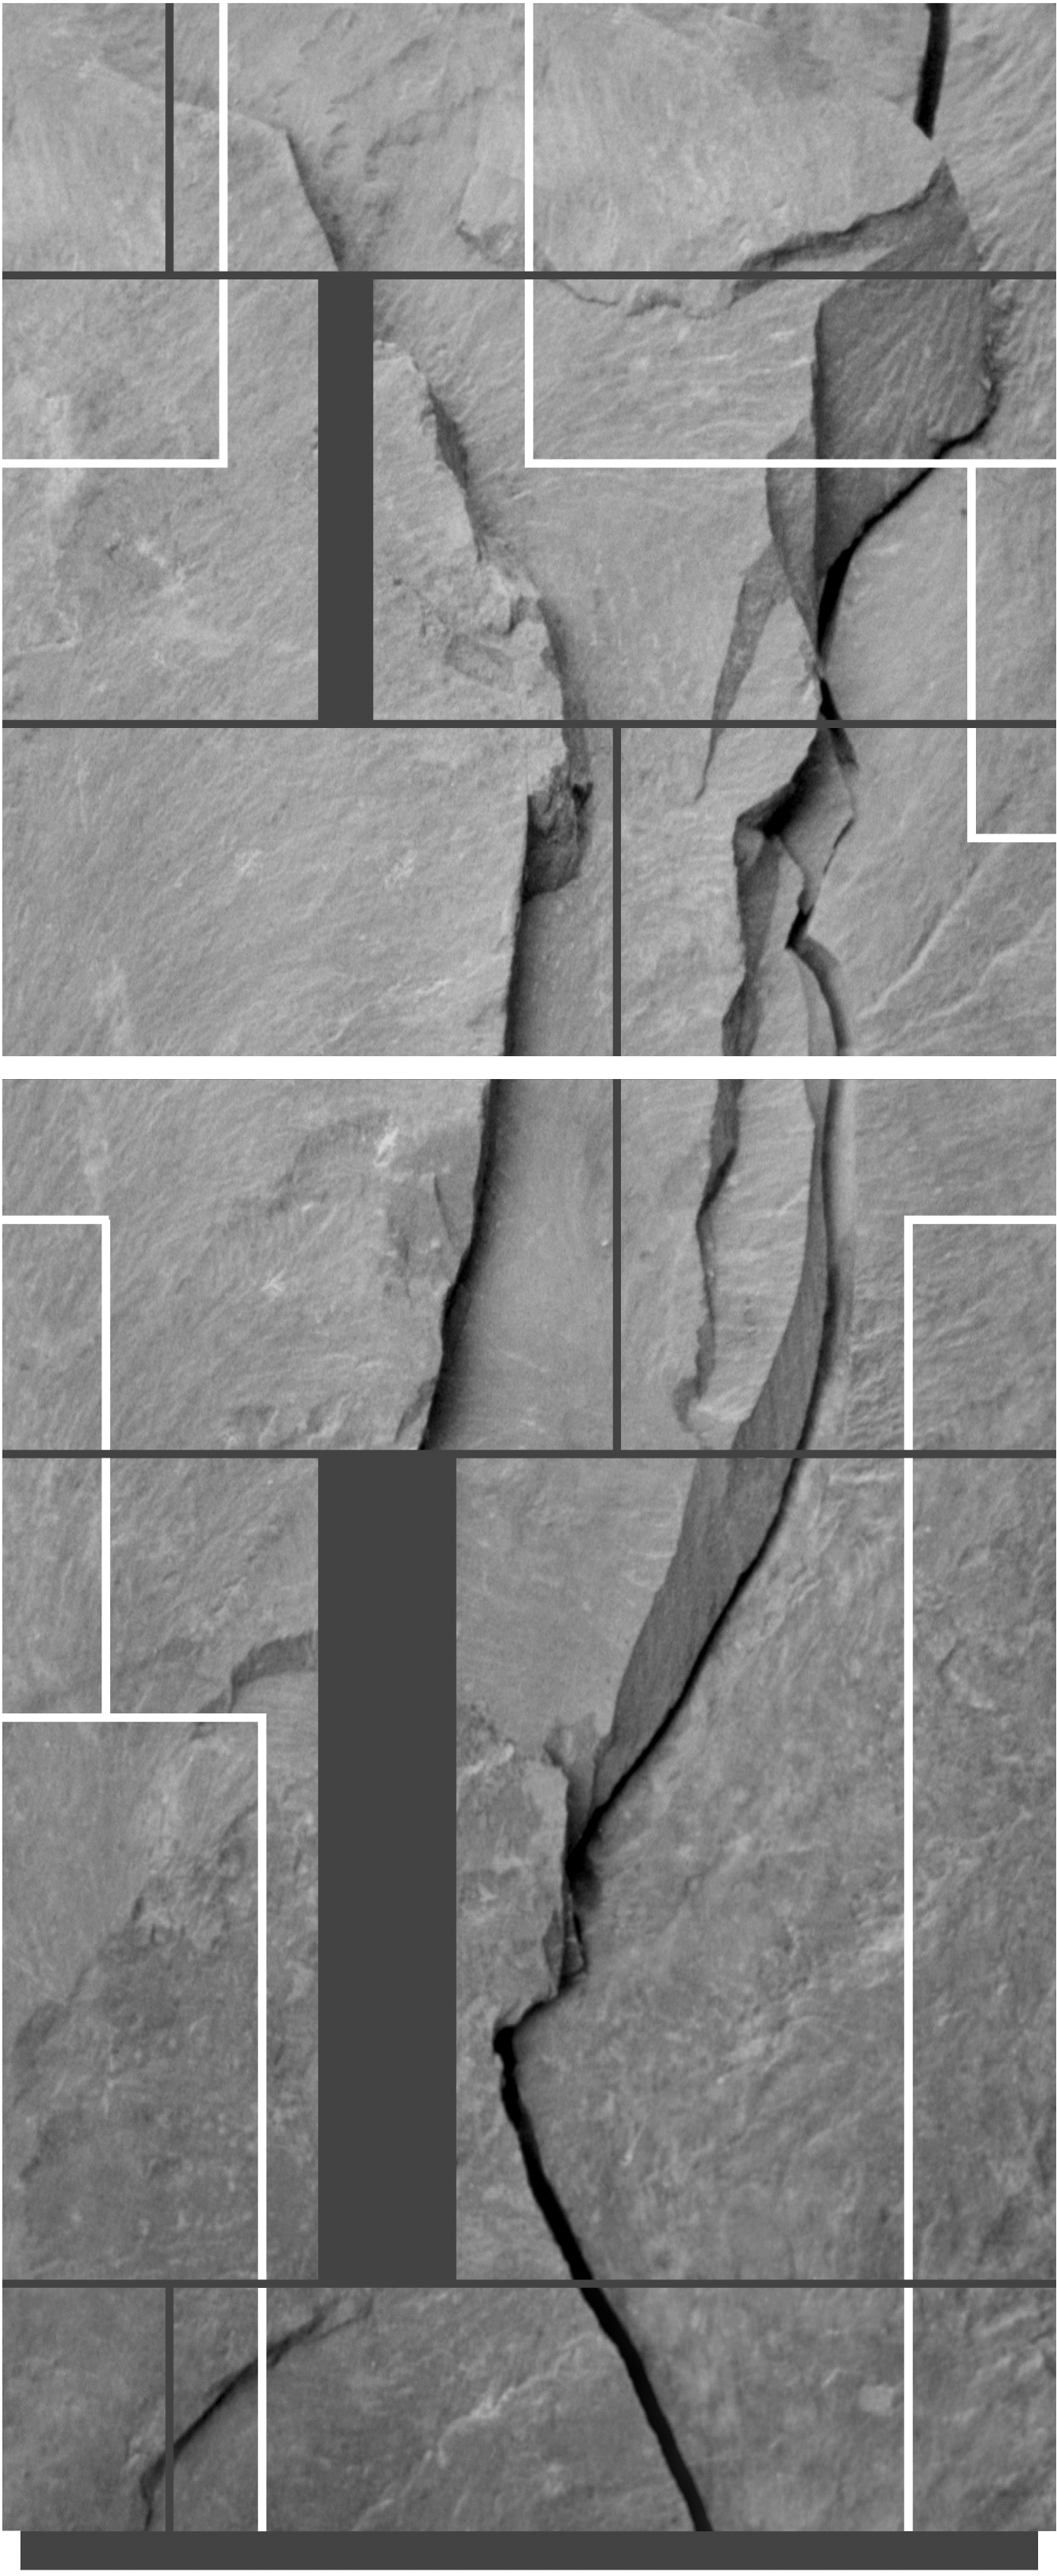 QMUL Ambiguous Object elevation.jpg